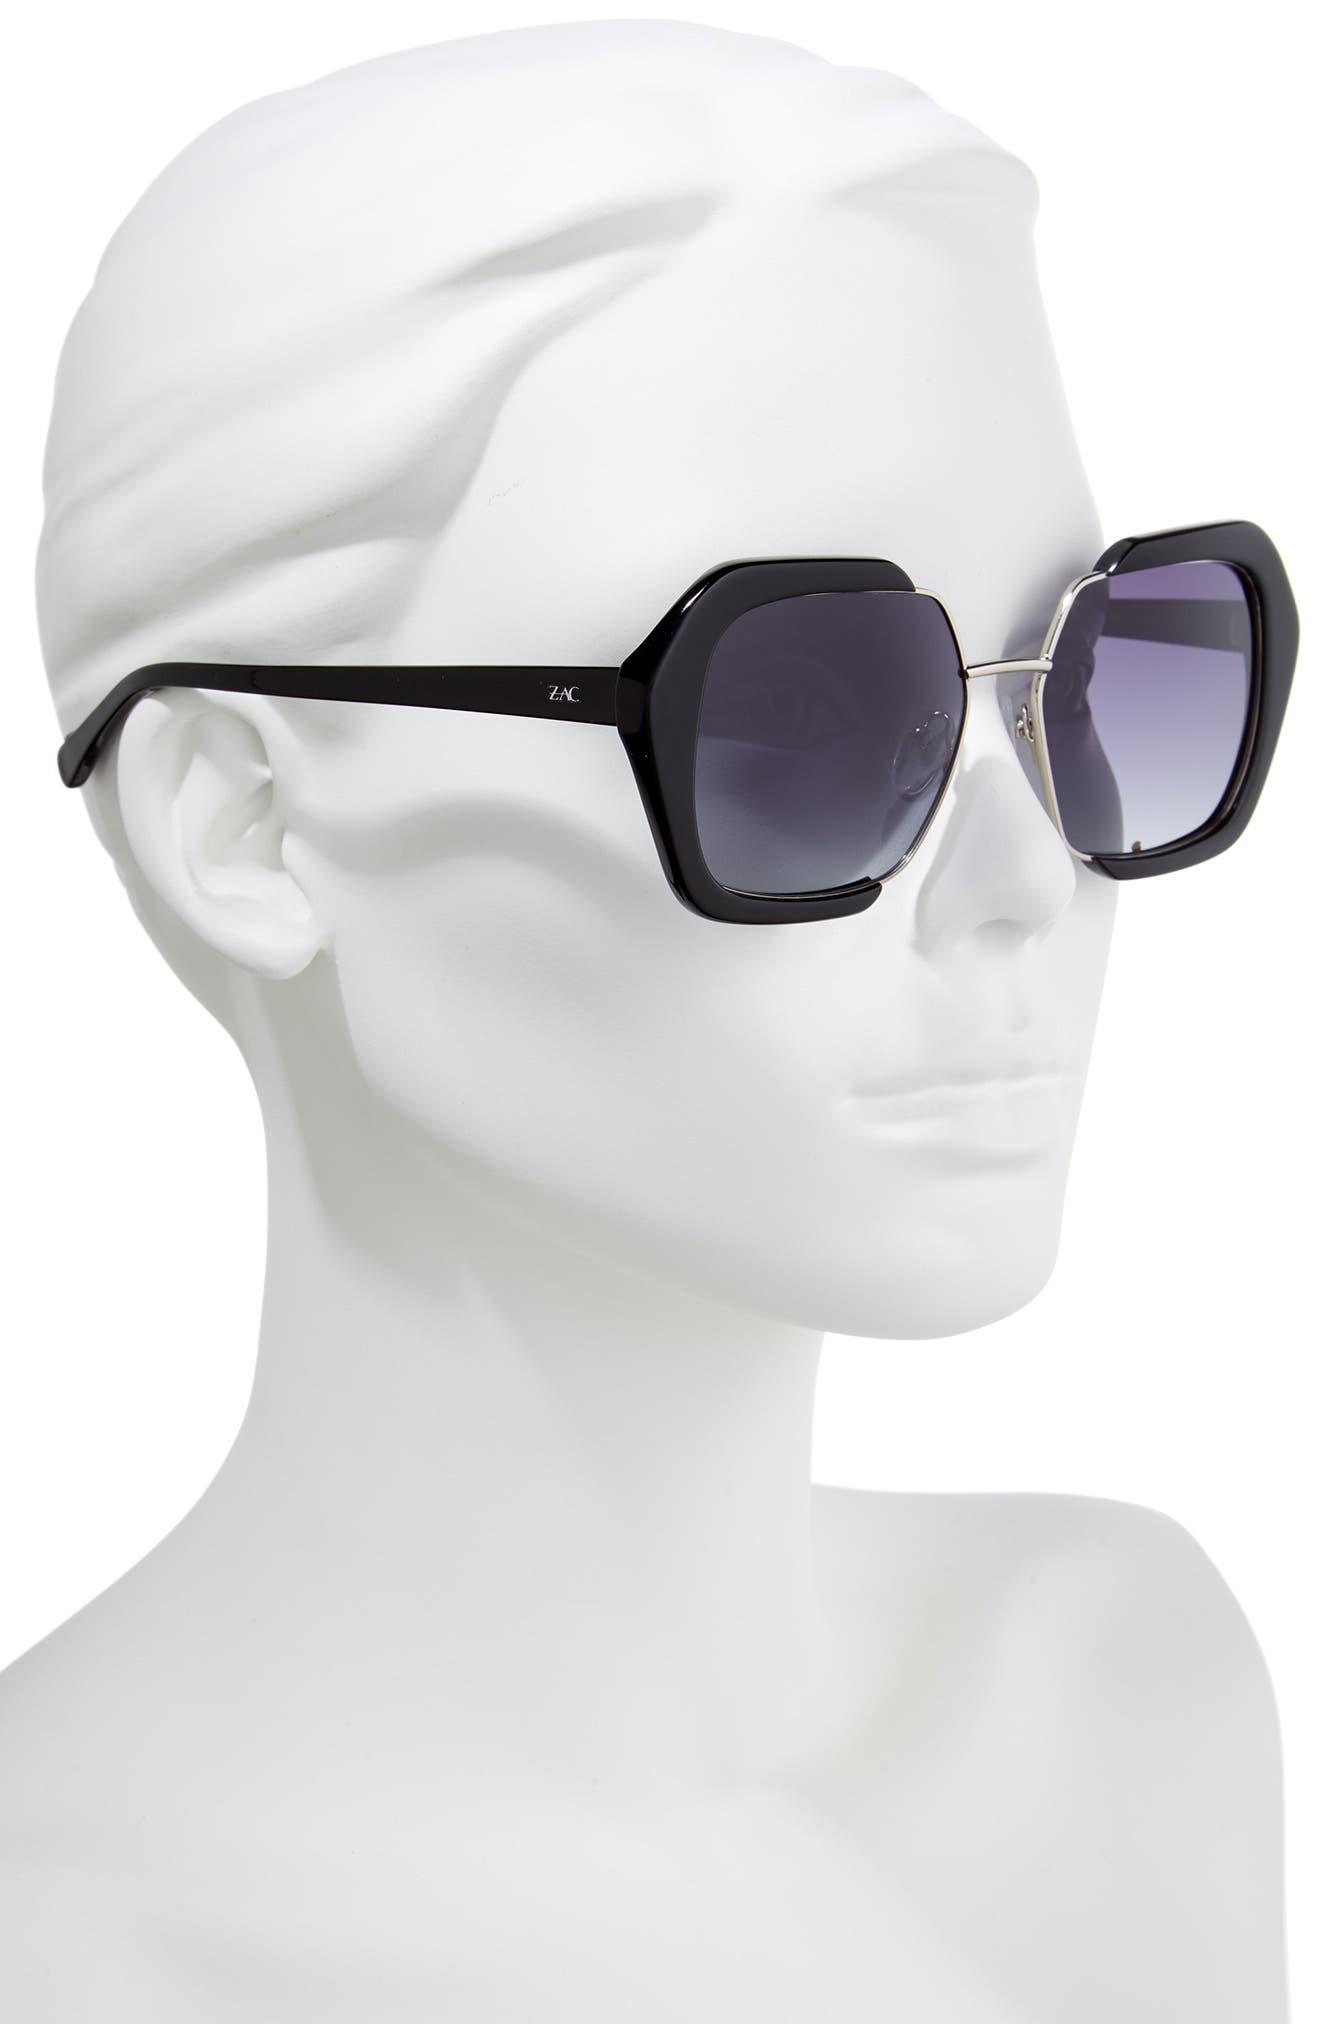 Isleen 55mm Polarized Sunglasses,                             Alternate thumbnail 2, color,                             BLACK POLAR